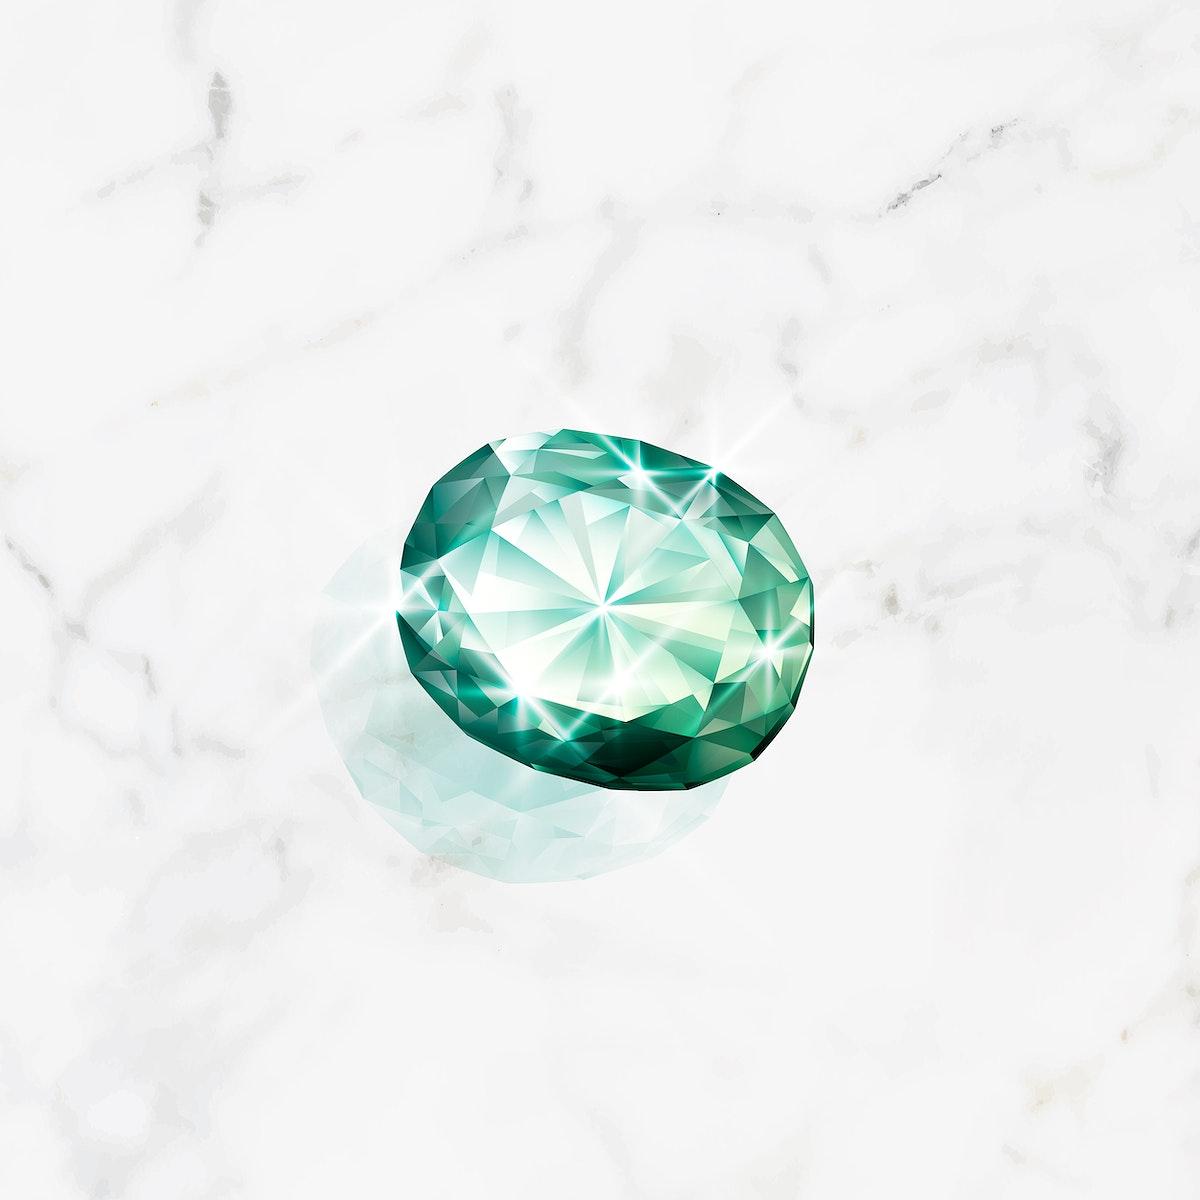 Green crystal gem design vector